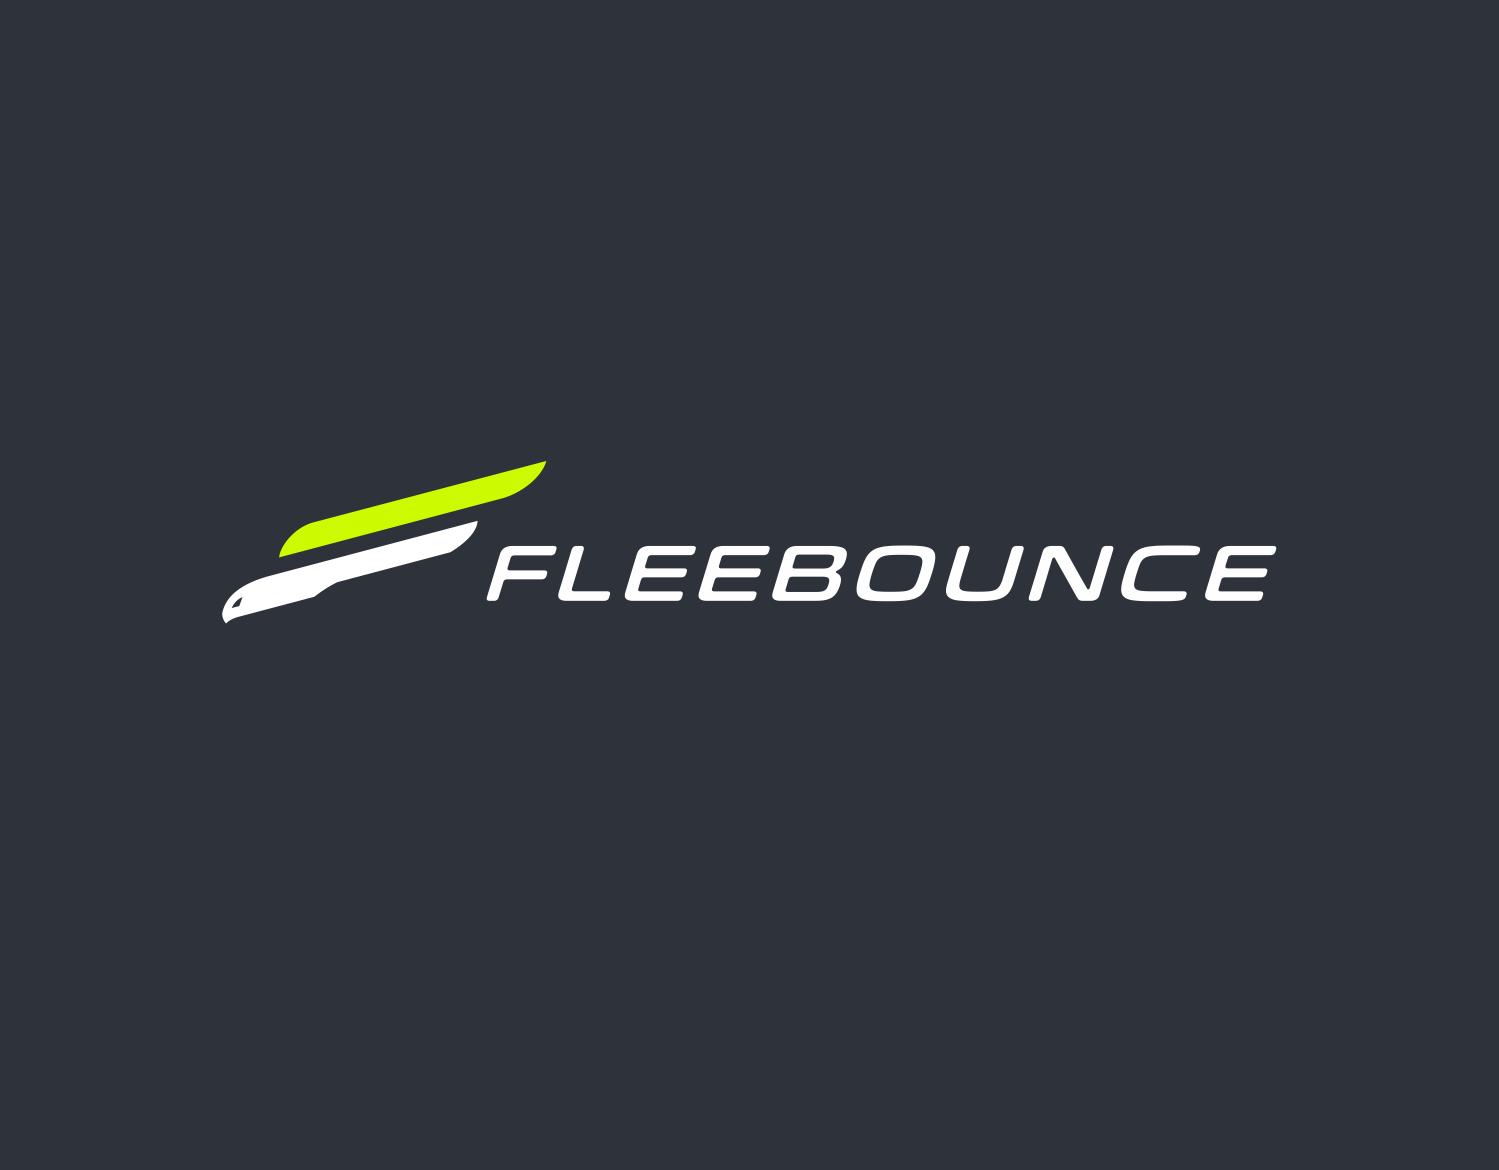 sport shoe brand requires a fresh logo